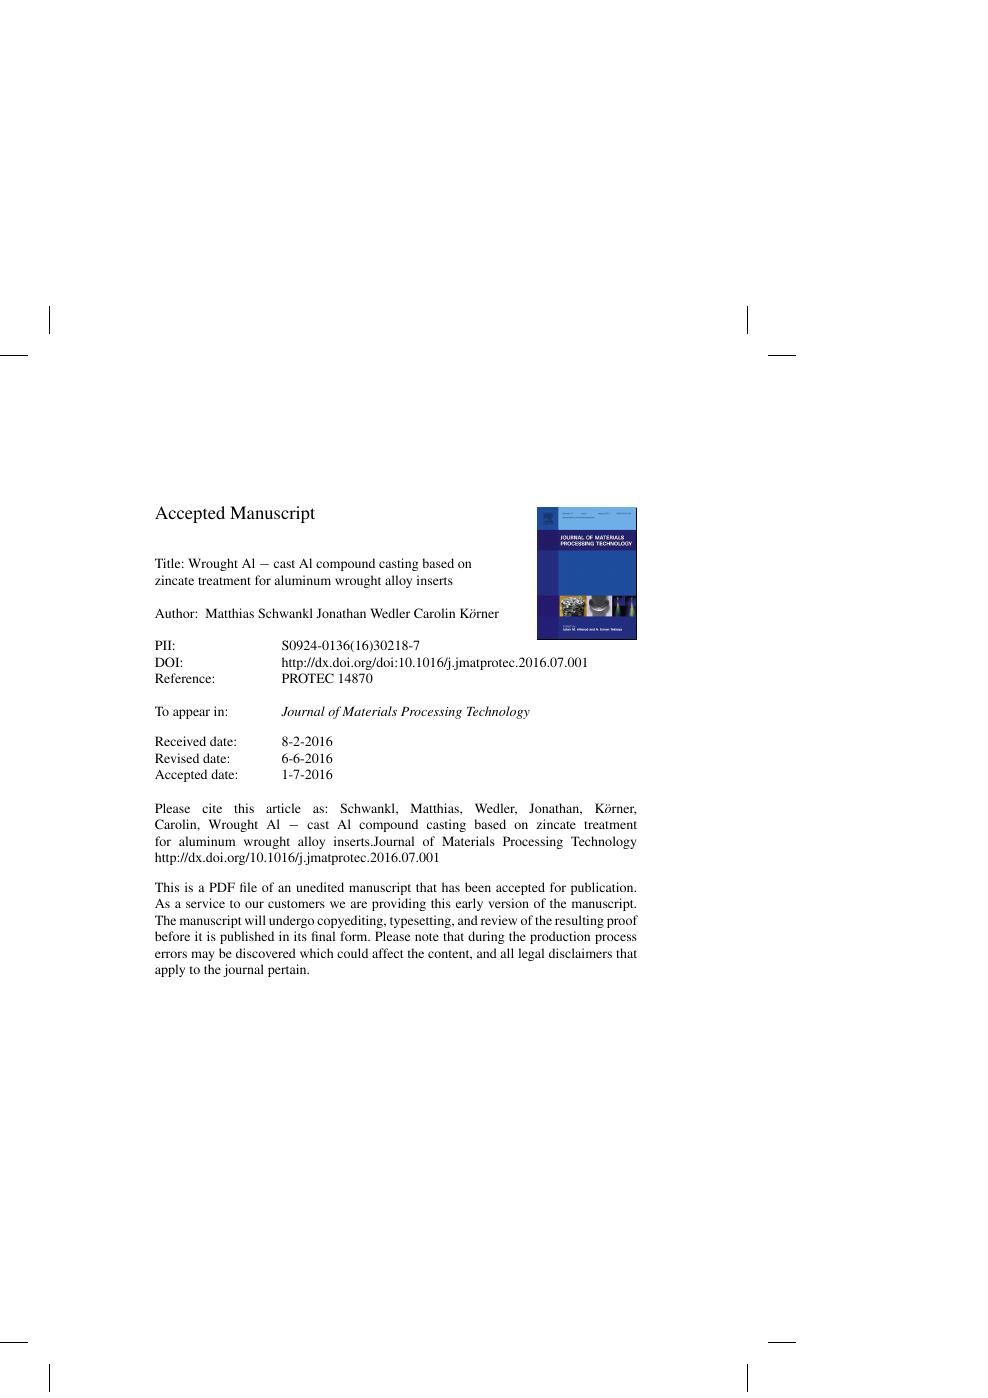 Wrought Al − cast Al compound casting based on zincate